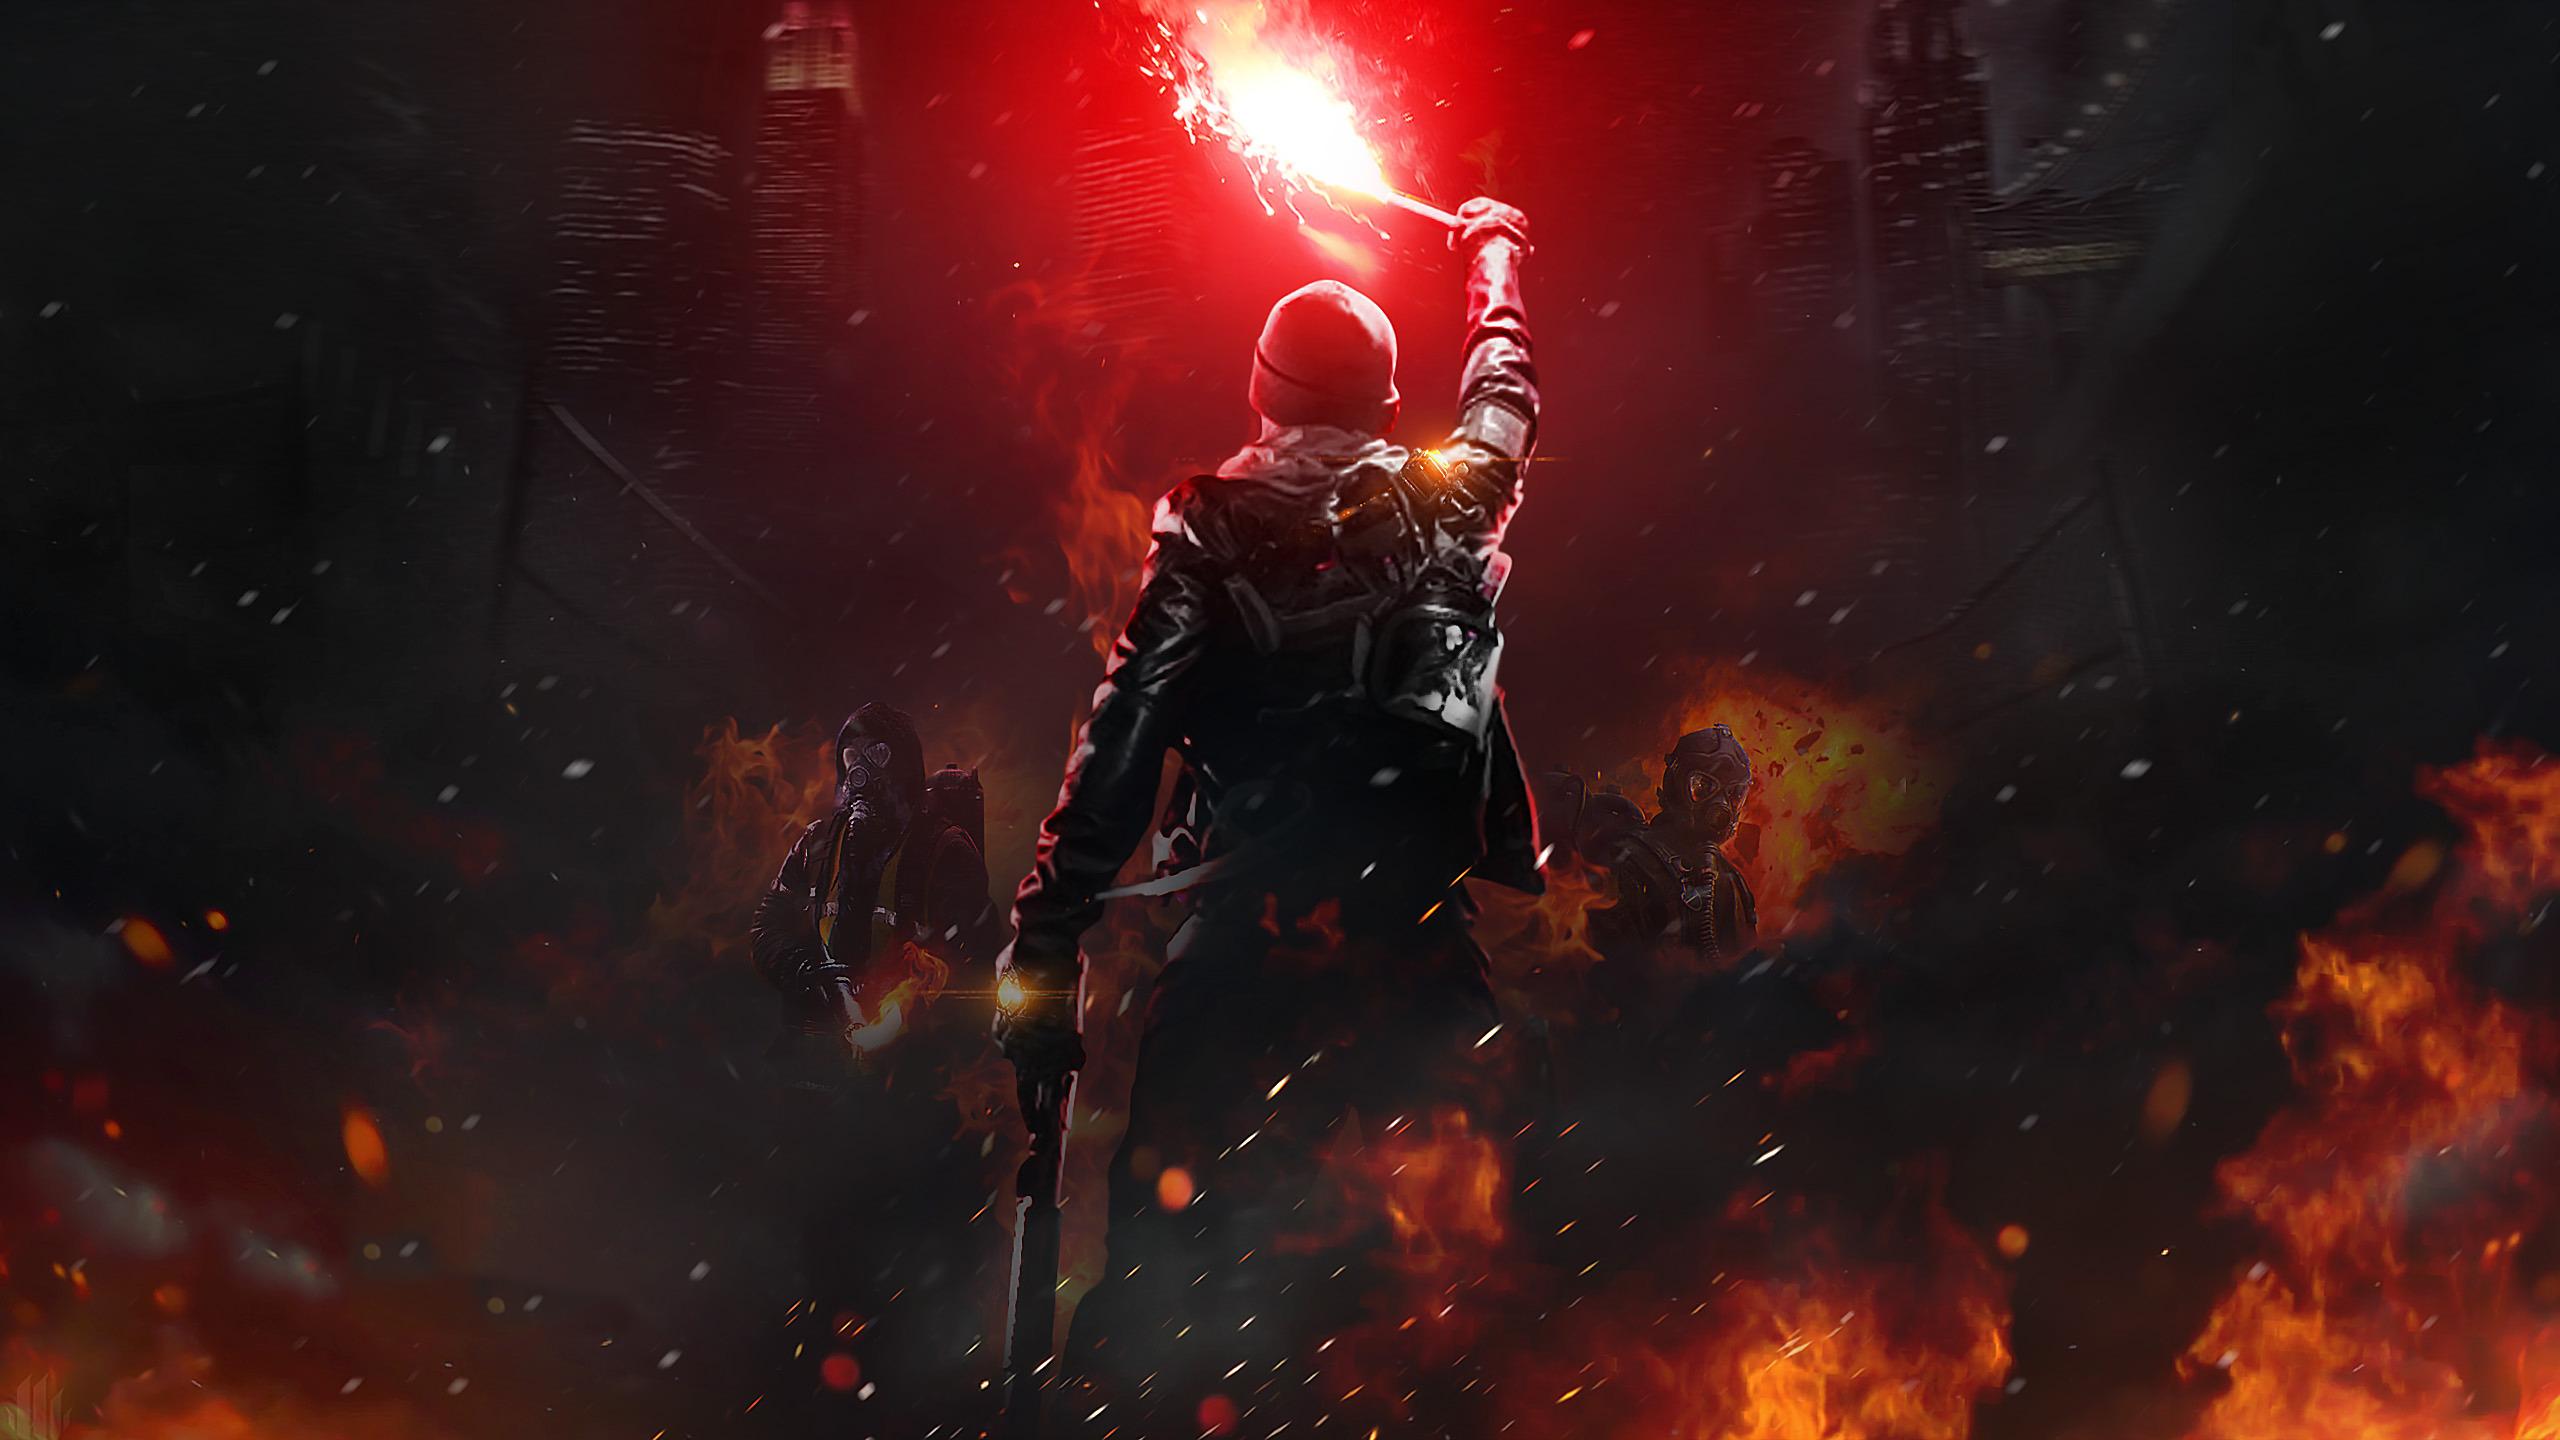 Download 2560x1440 Wallpaper Masked Soldiers Dark Fire